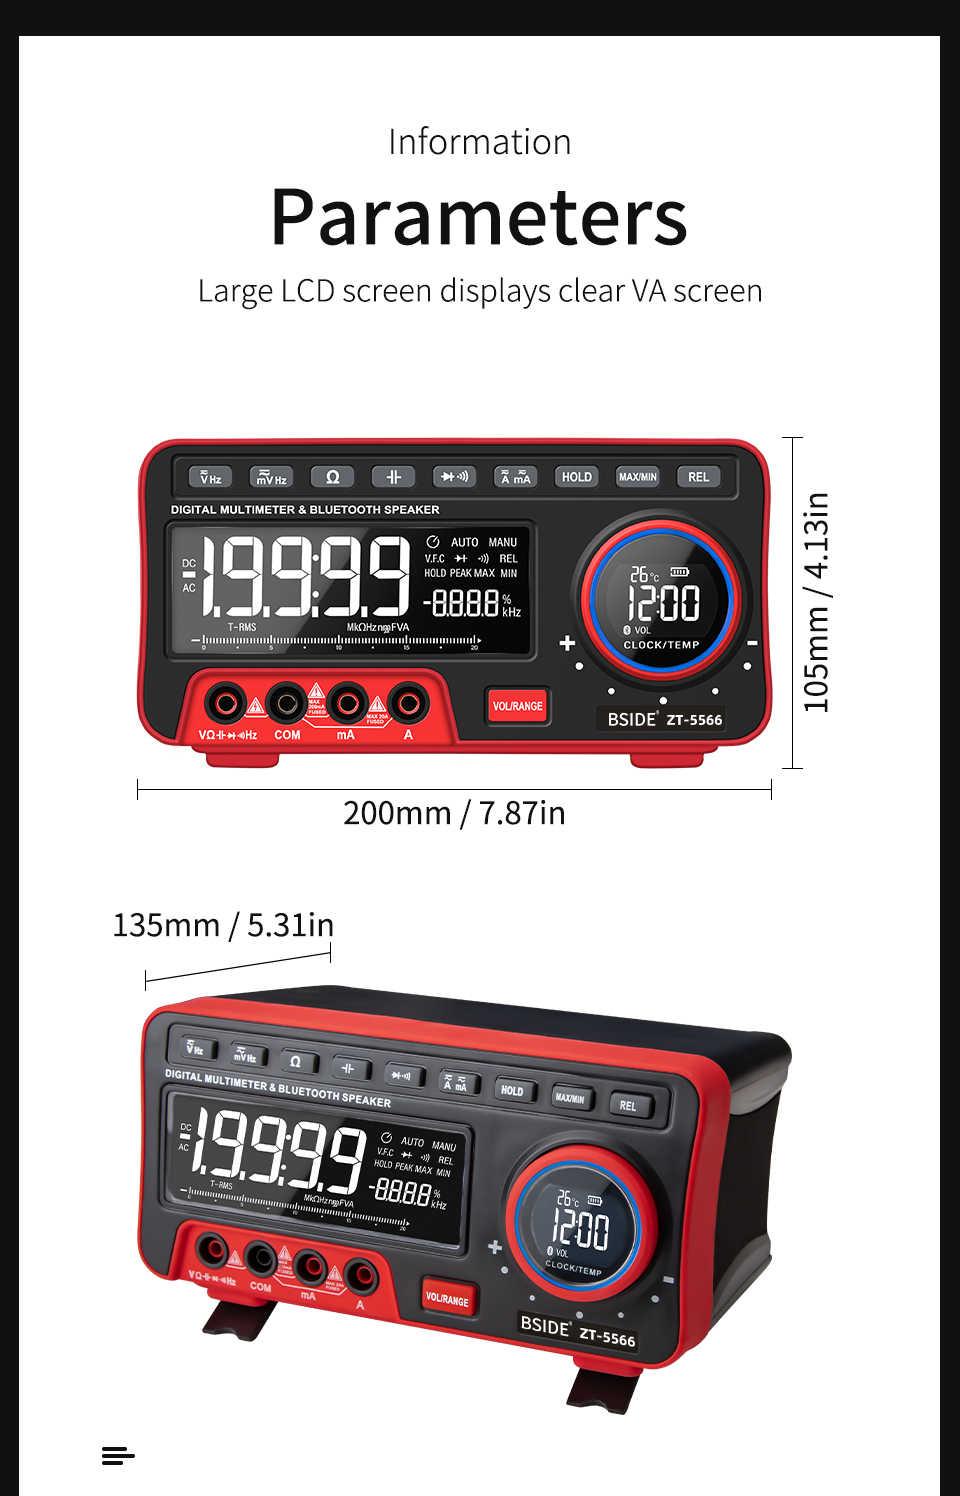 Bside Dual Display Digitale Multimeter Ebtn + Wireless Speaker + Klok 19999 Telt Tafelmodel Dmm Met 2 Stuks 18650 Batterij